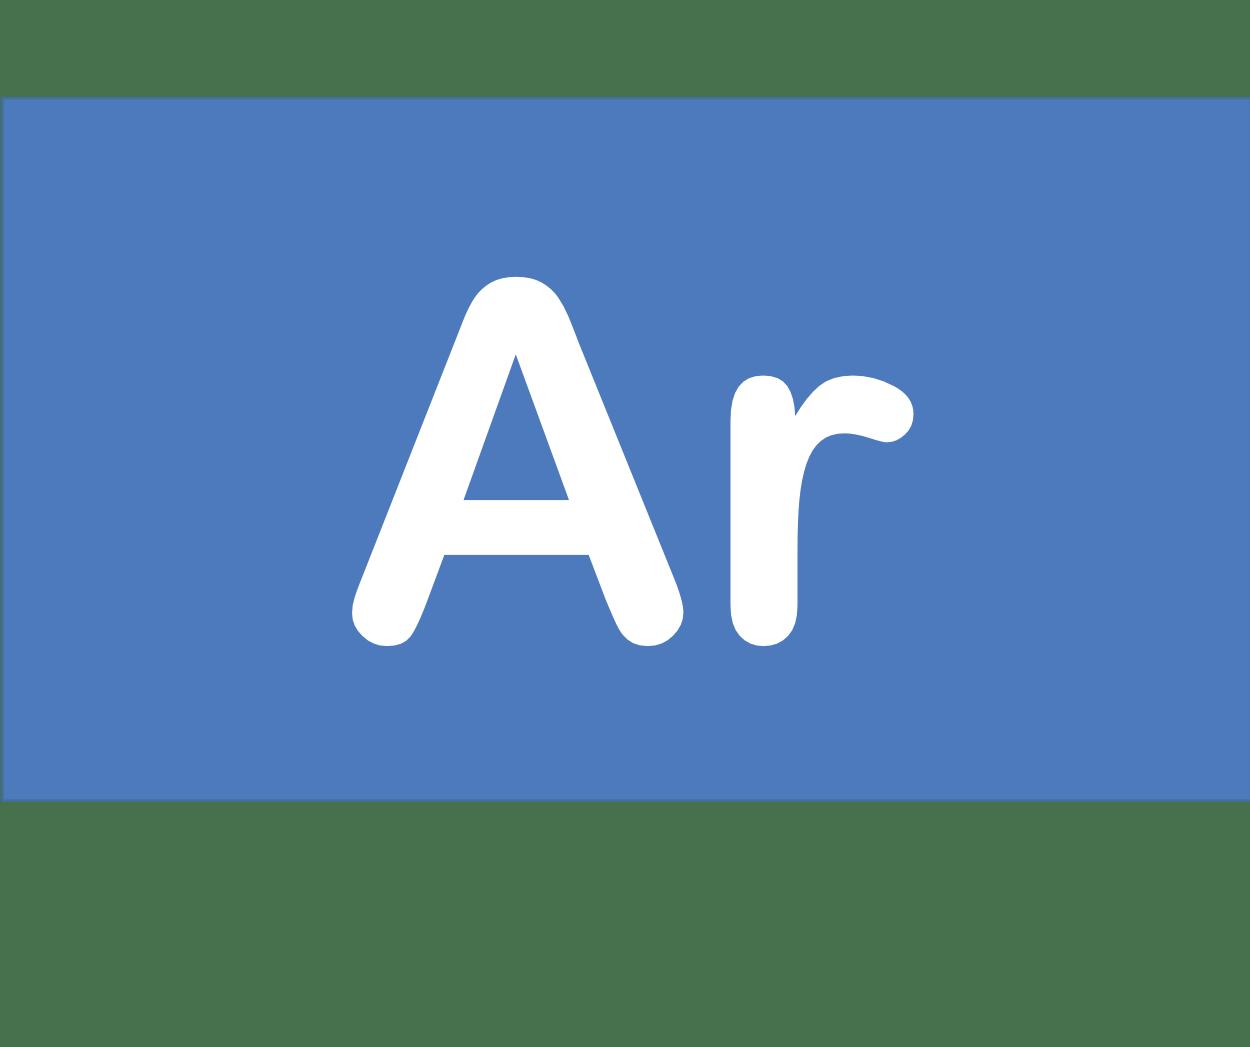 18 Ar アルゴン Argon 元素 記号 周期表 化学 原子